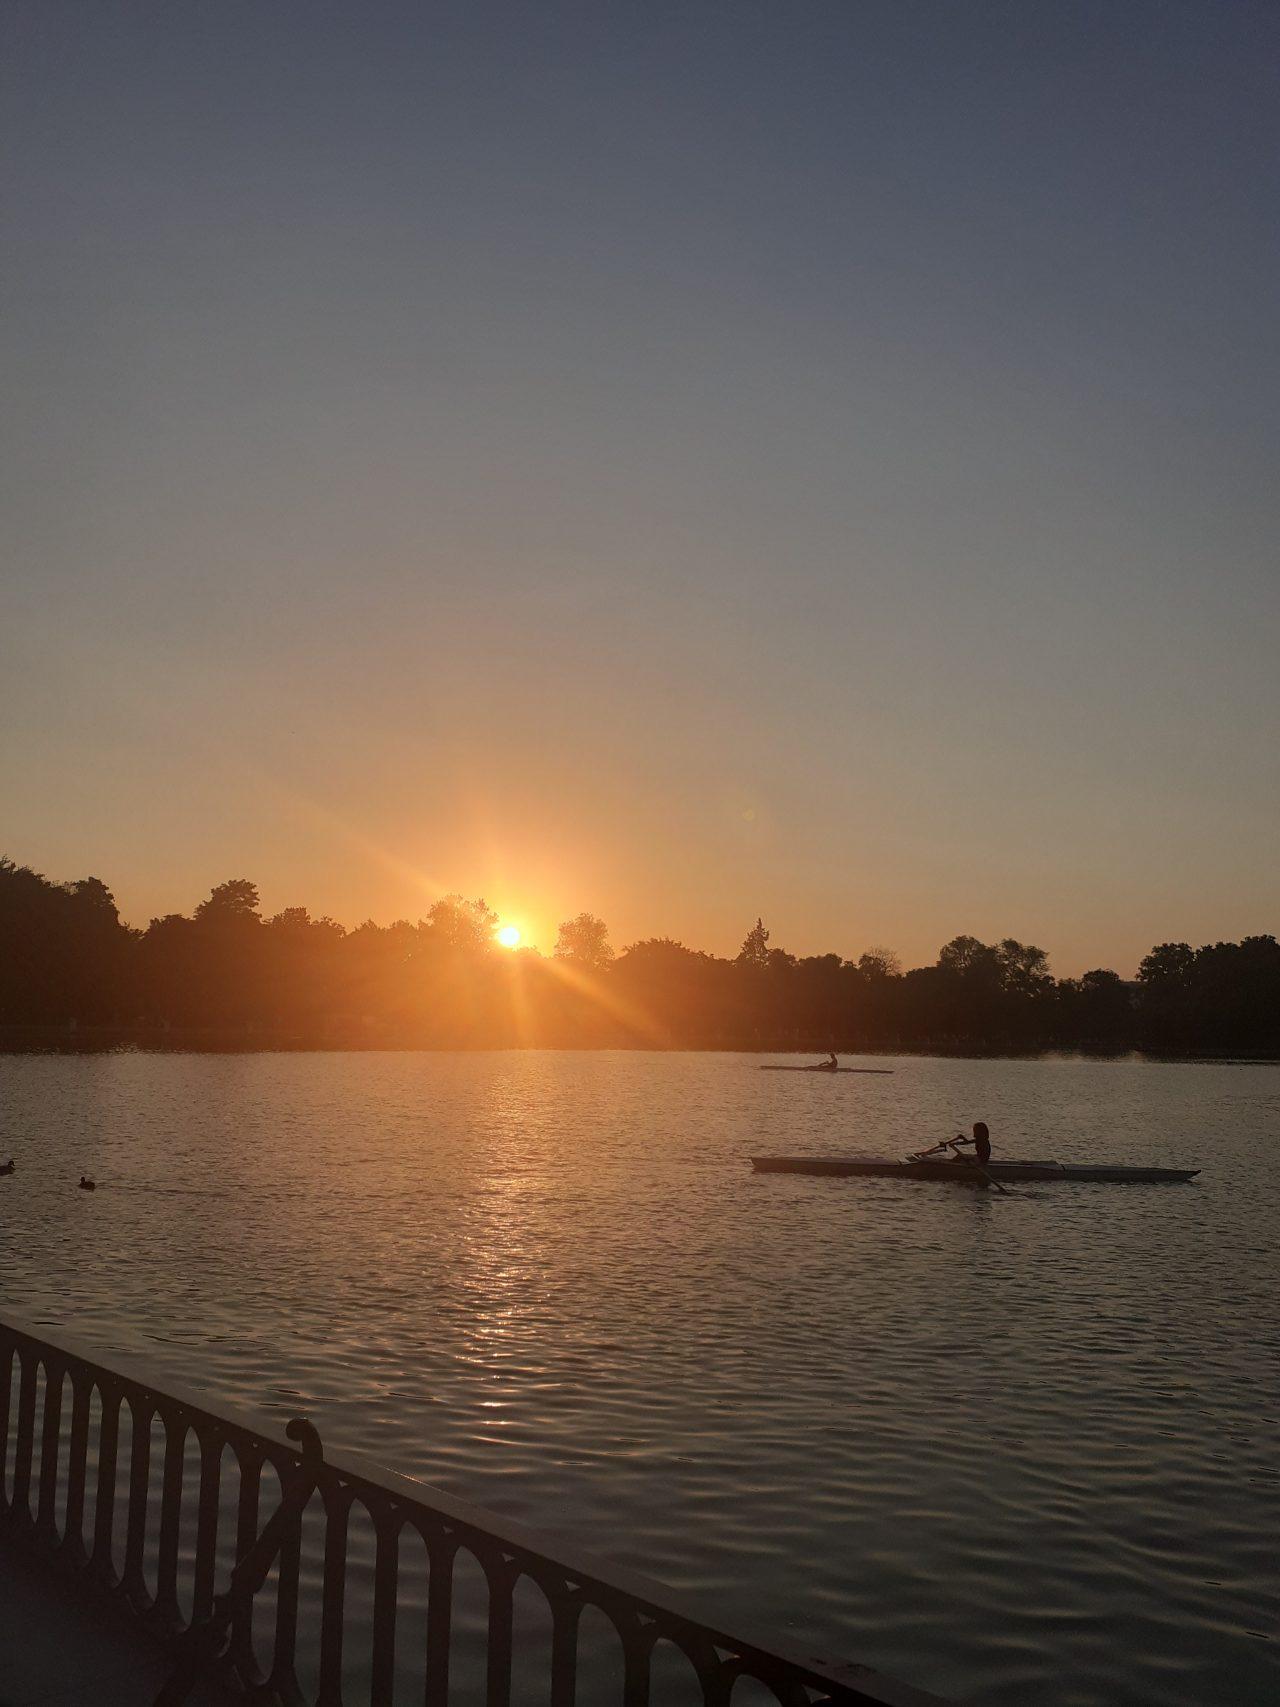 https://www.monicachacin.com/wp-content/uploads/2021/08/parque-del-retiro-madrid-estanque-barcas-remar-emprendedores-1280x1707.jpg